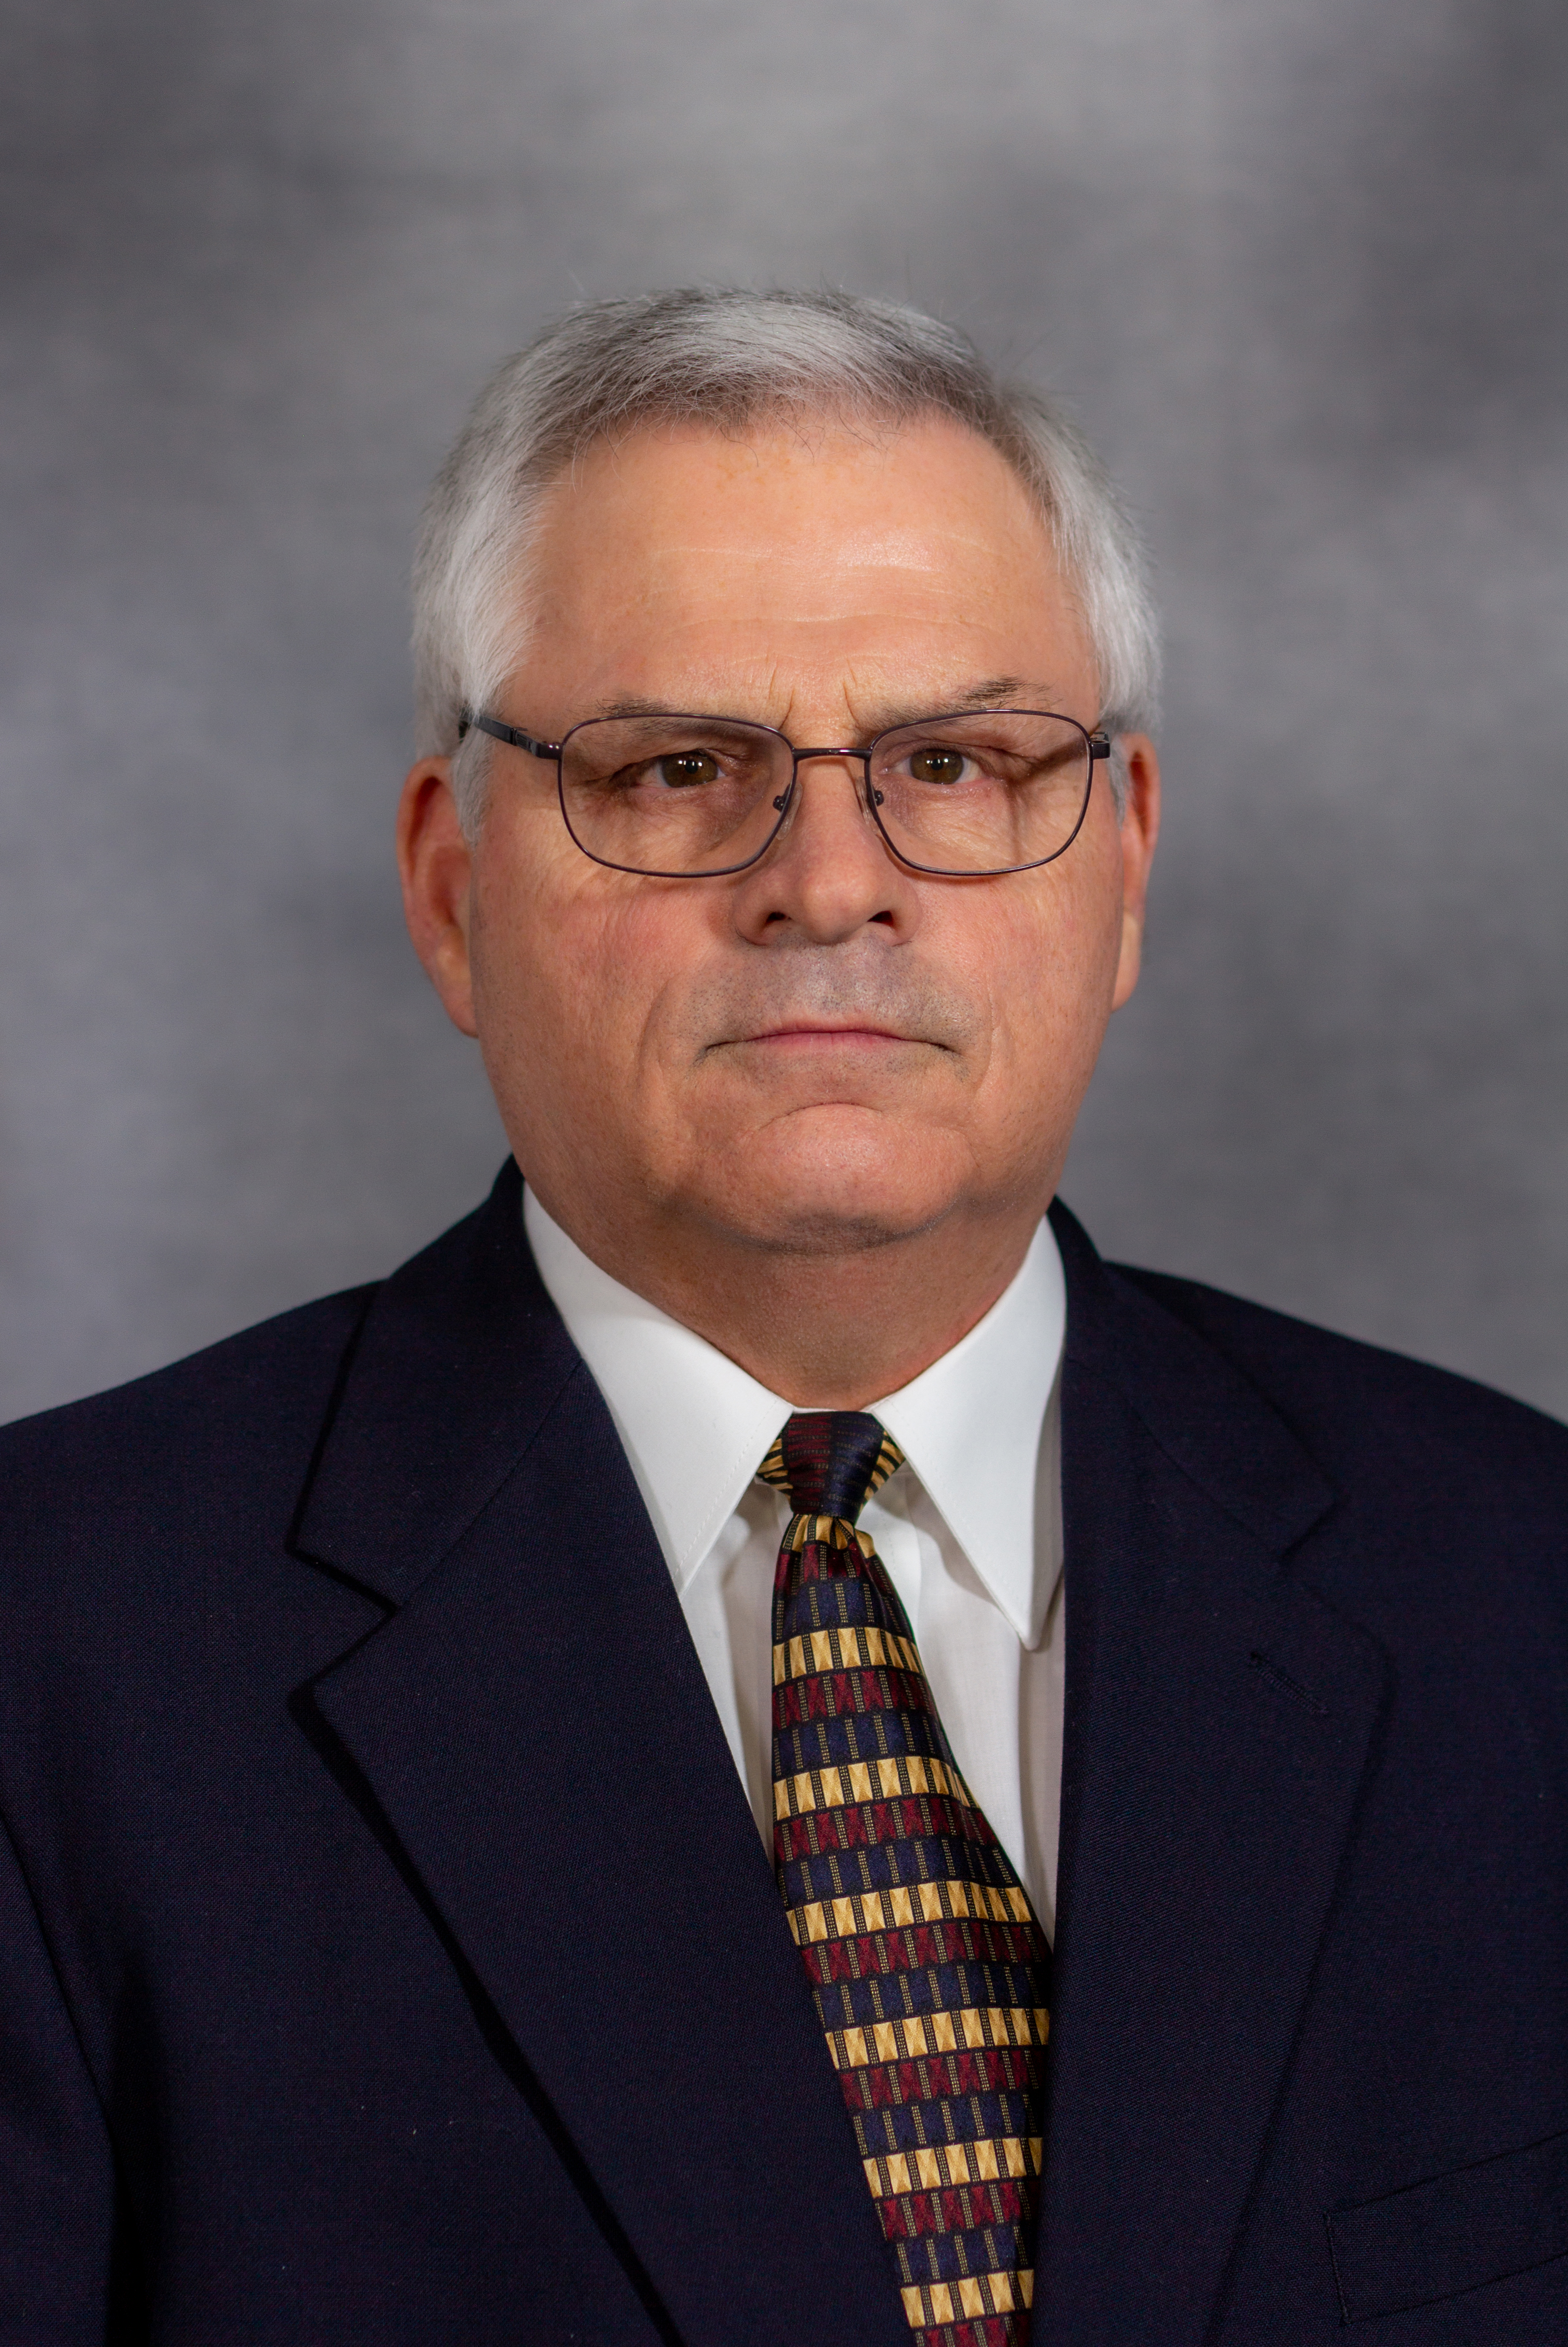 Michael Phillips, Warden